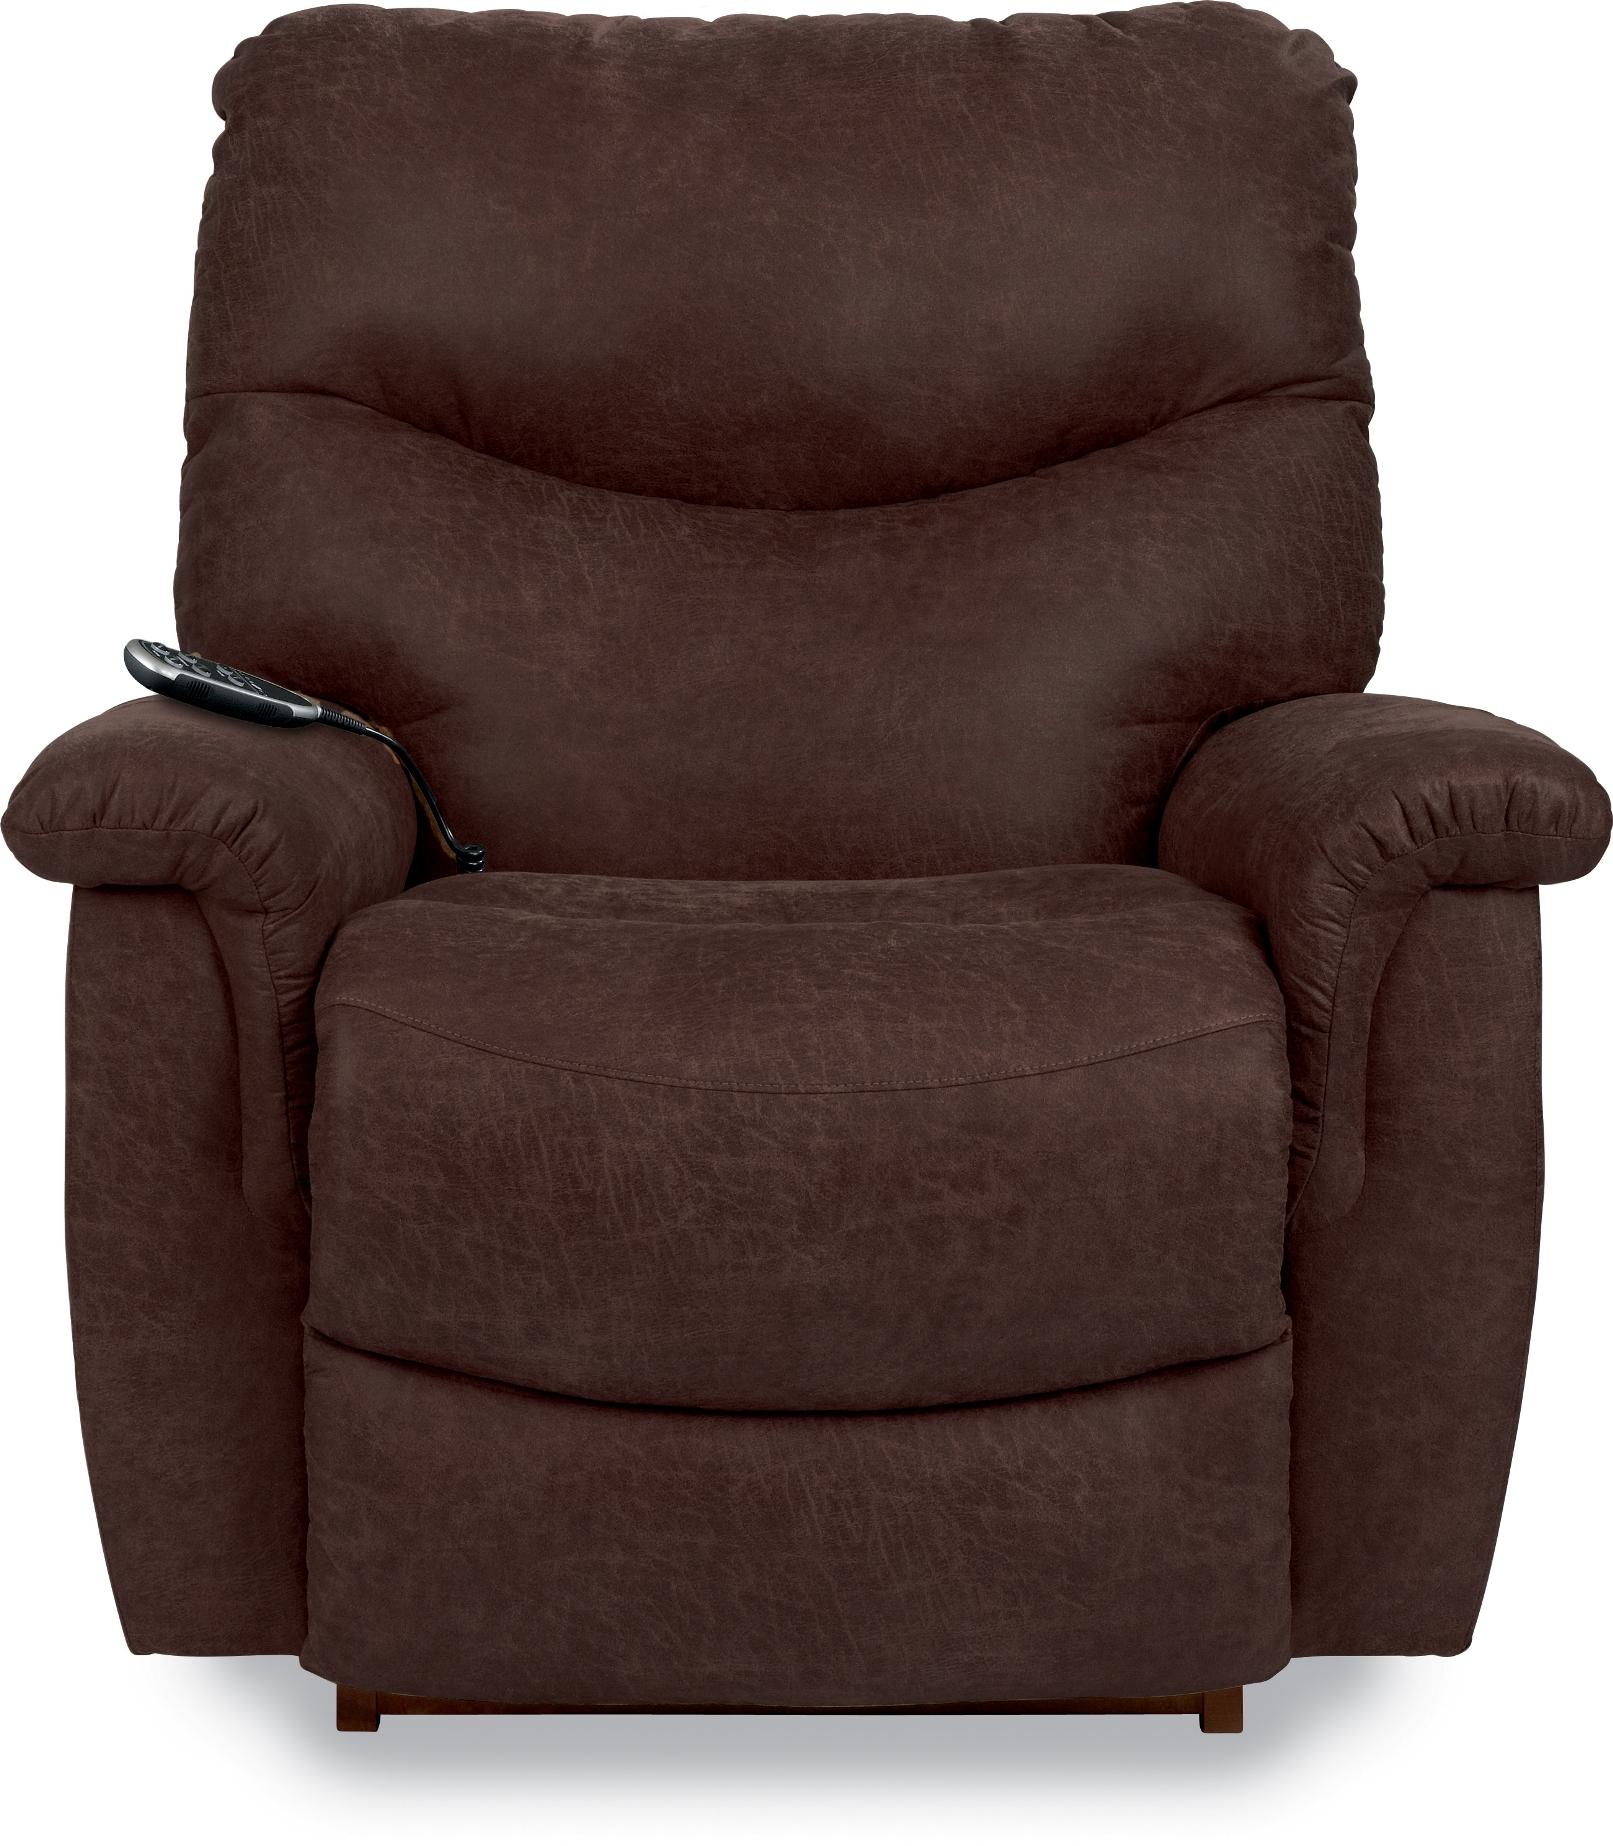 lazy boy chair covers nz lounge cushions canada la z riley power recliner